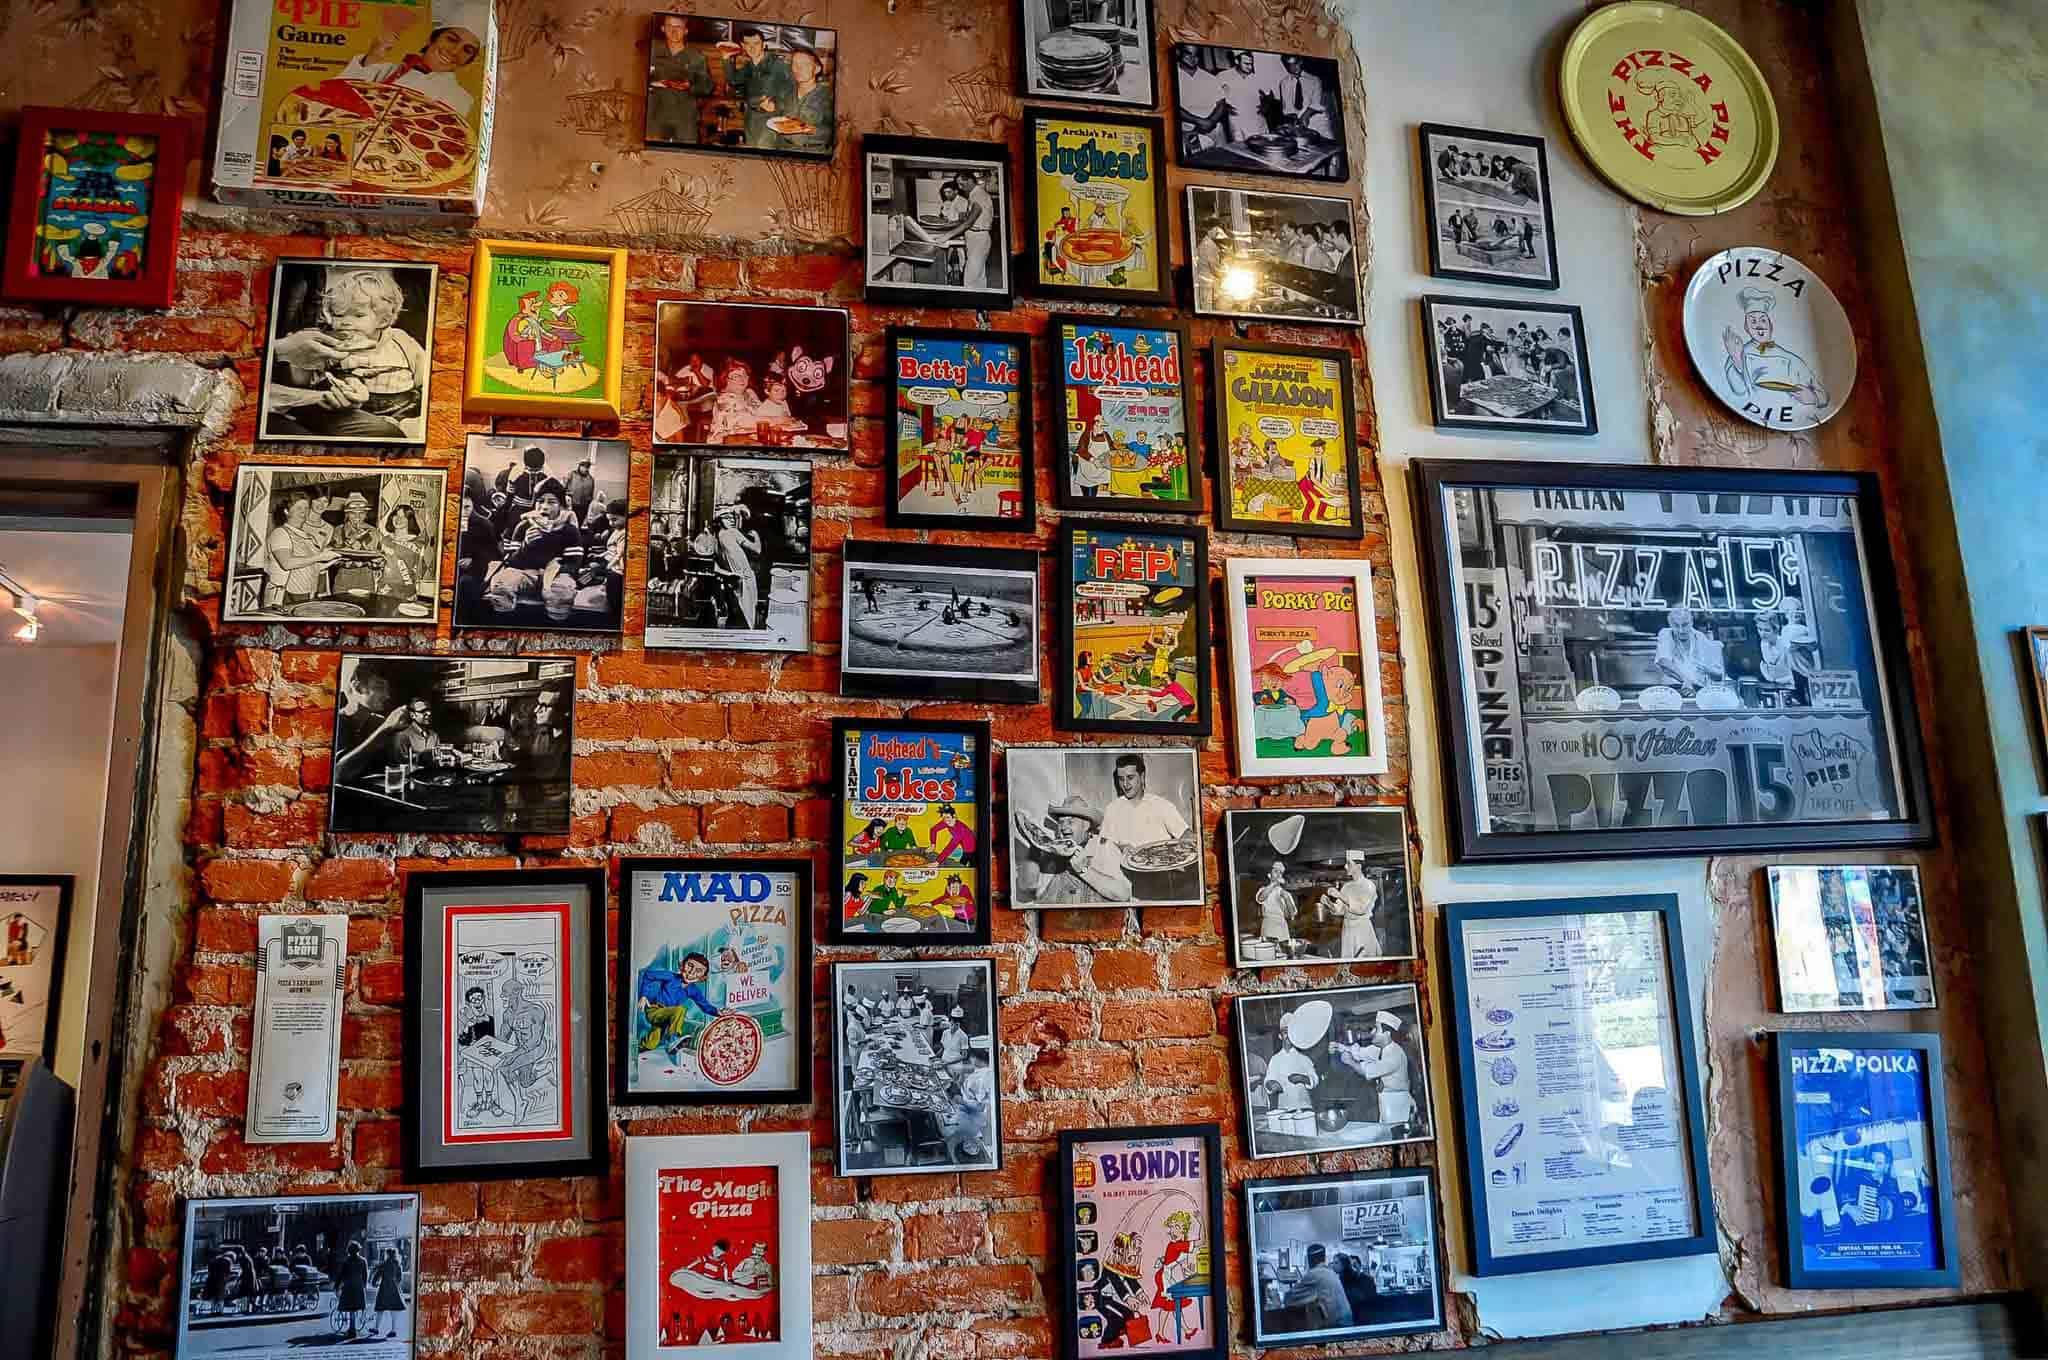 Wall of framed pizza memorabilia